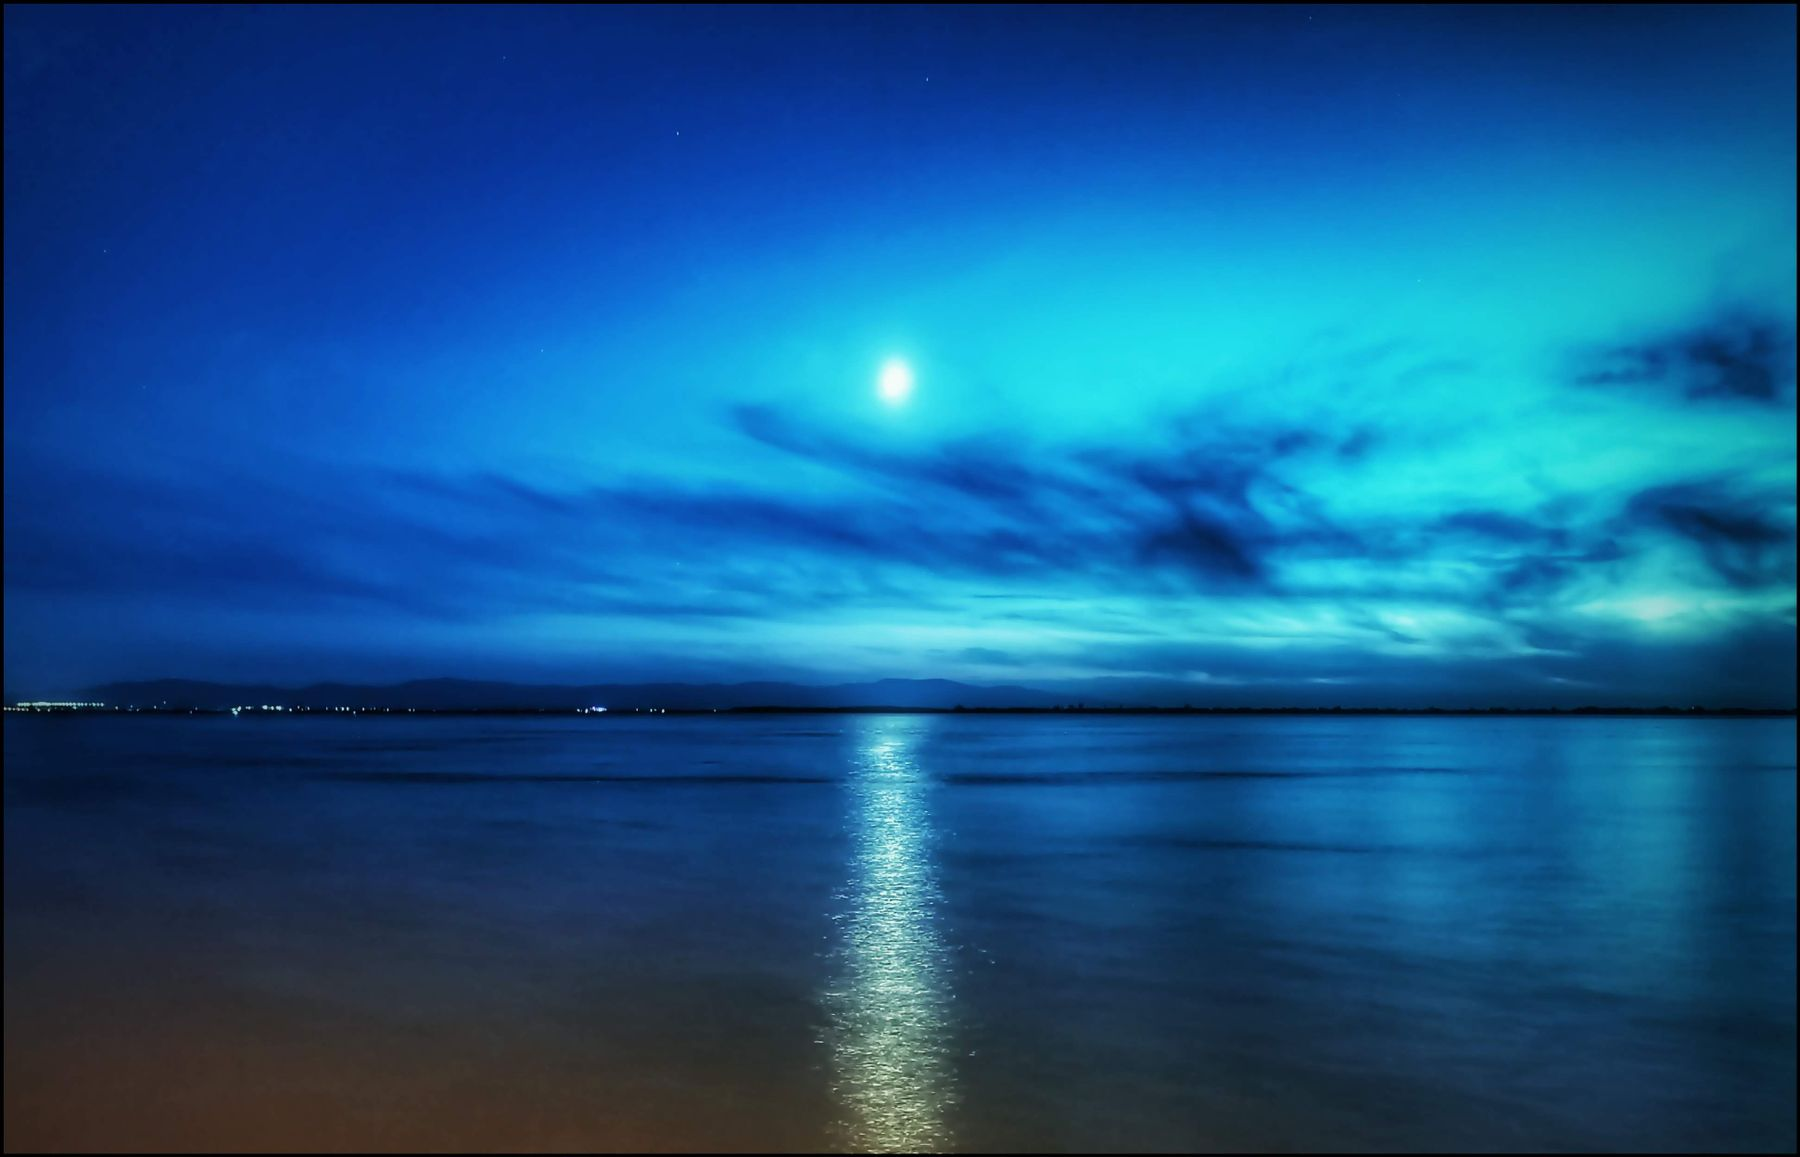 Луна над Амуром ДВ хабкрай khv bkn sktkachenko DV nature amazing blue природа красотища голубой нашкрай nashkray27 amur амур